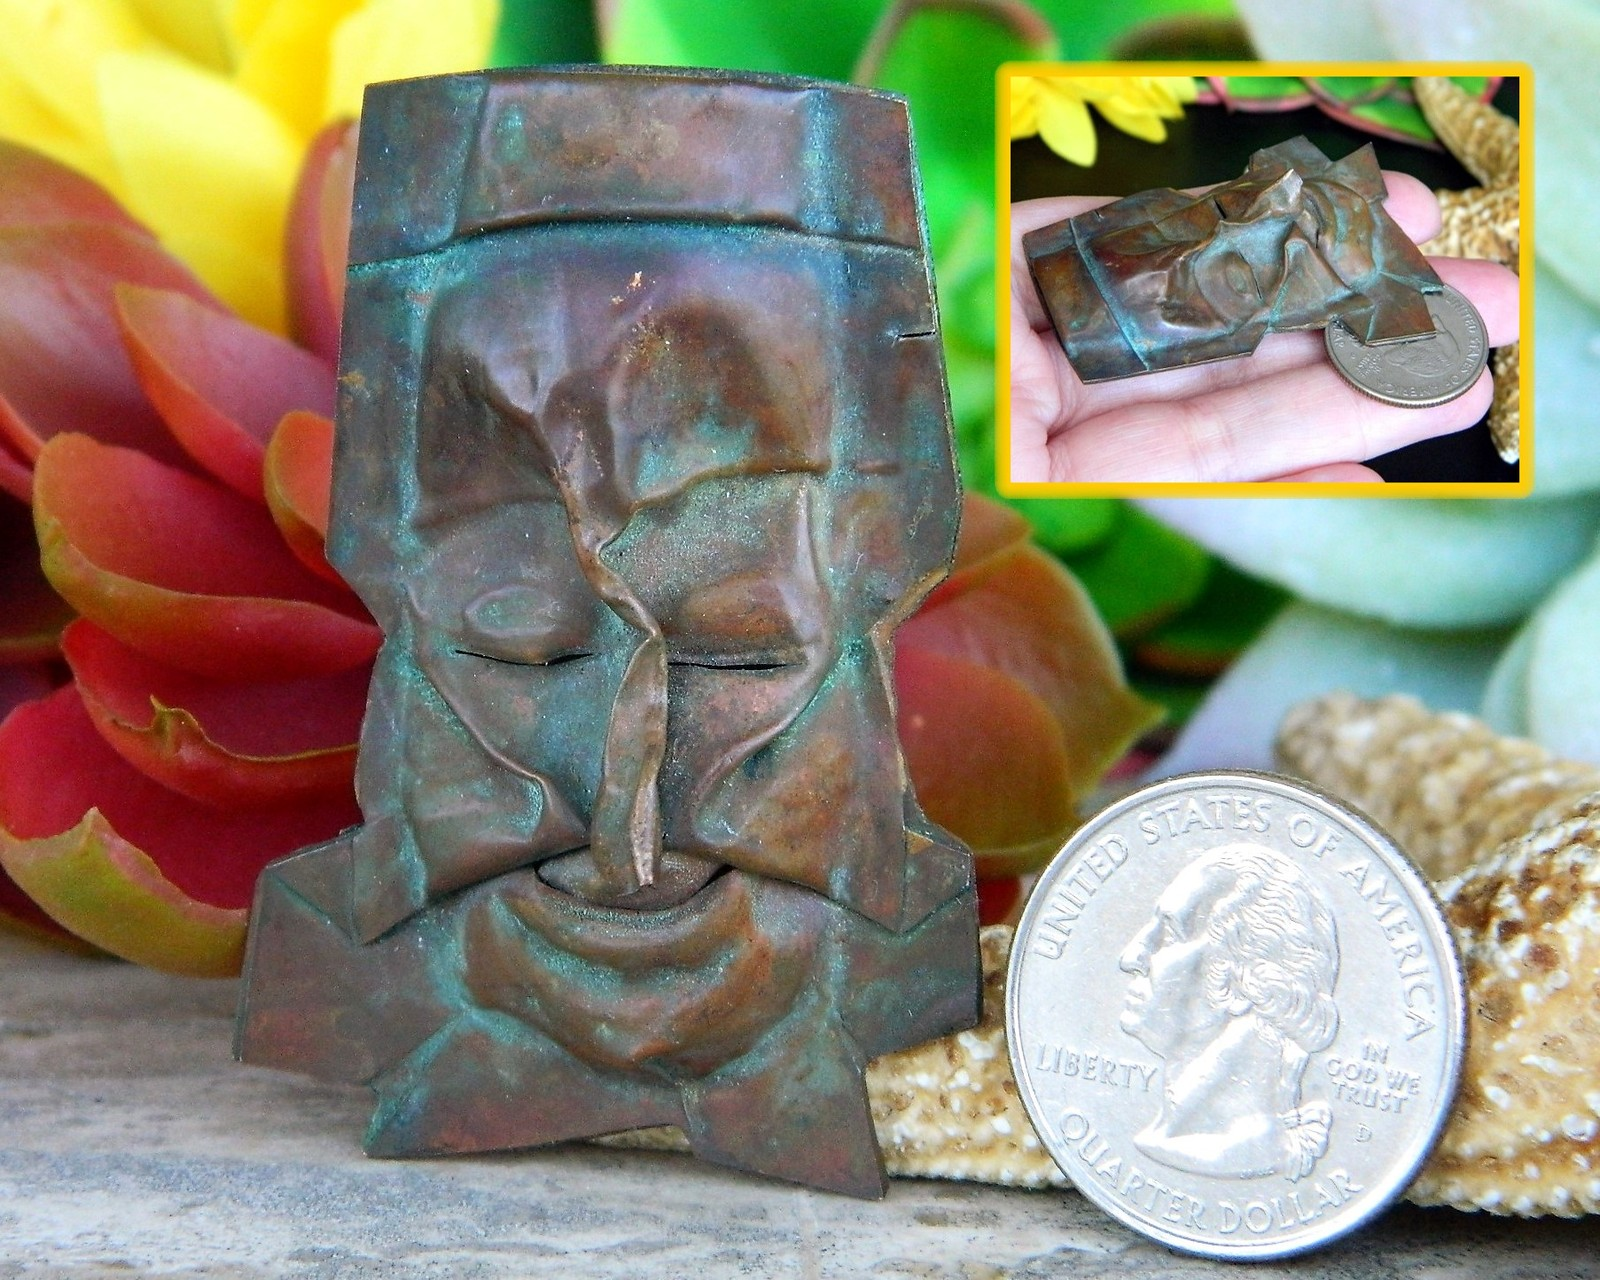 Vintage Face Brooch Pin Copper Metal Artisan Handcrafted Figural OOAK